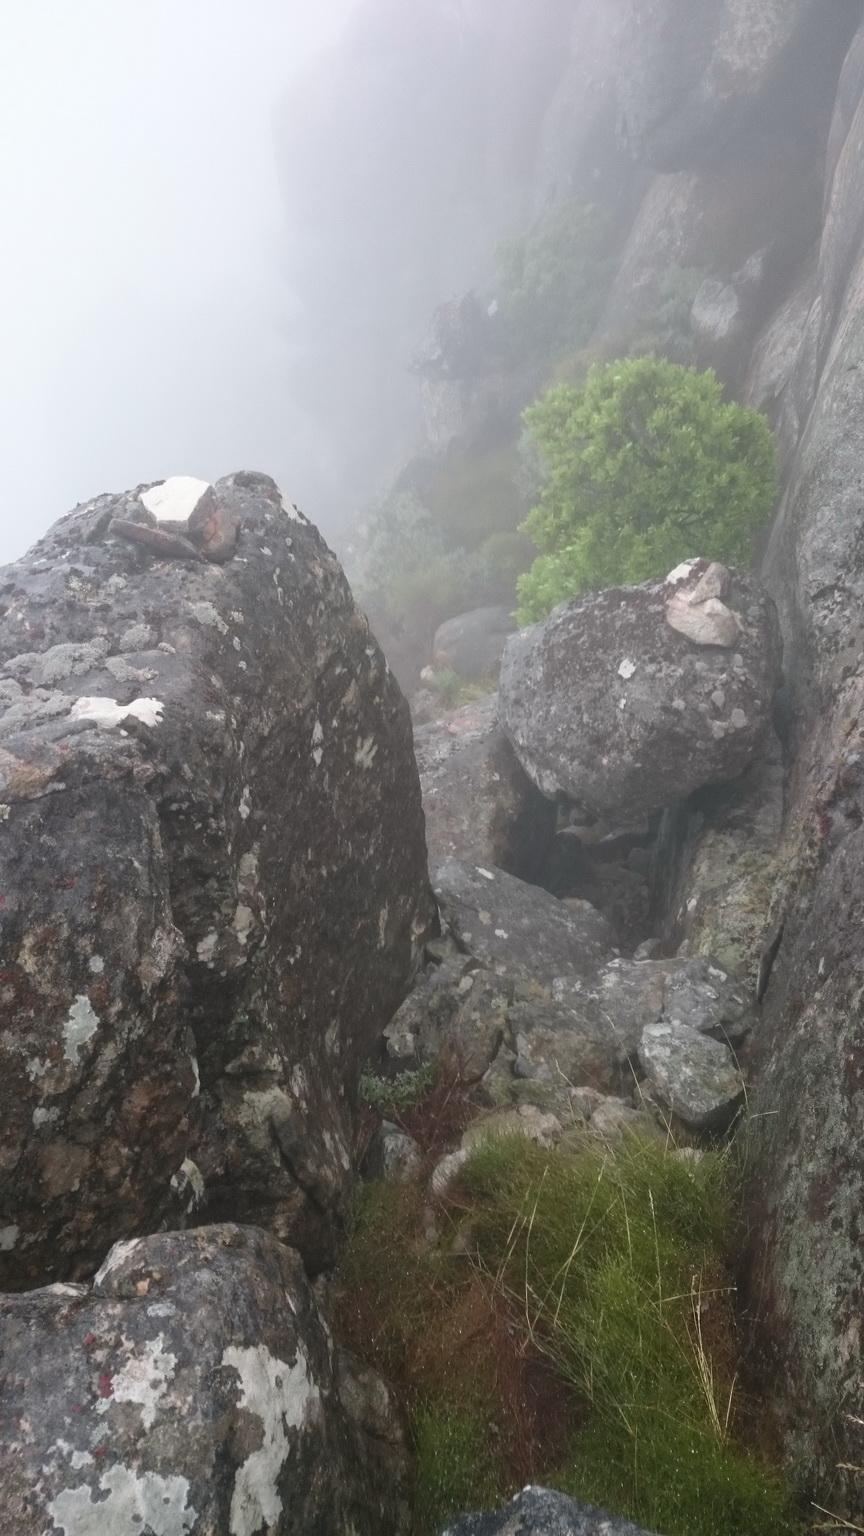 Stepping down Squaretower Peak